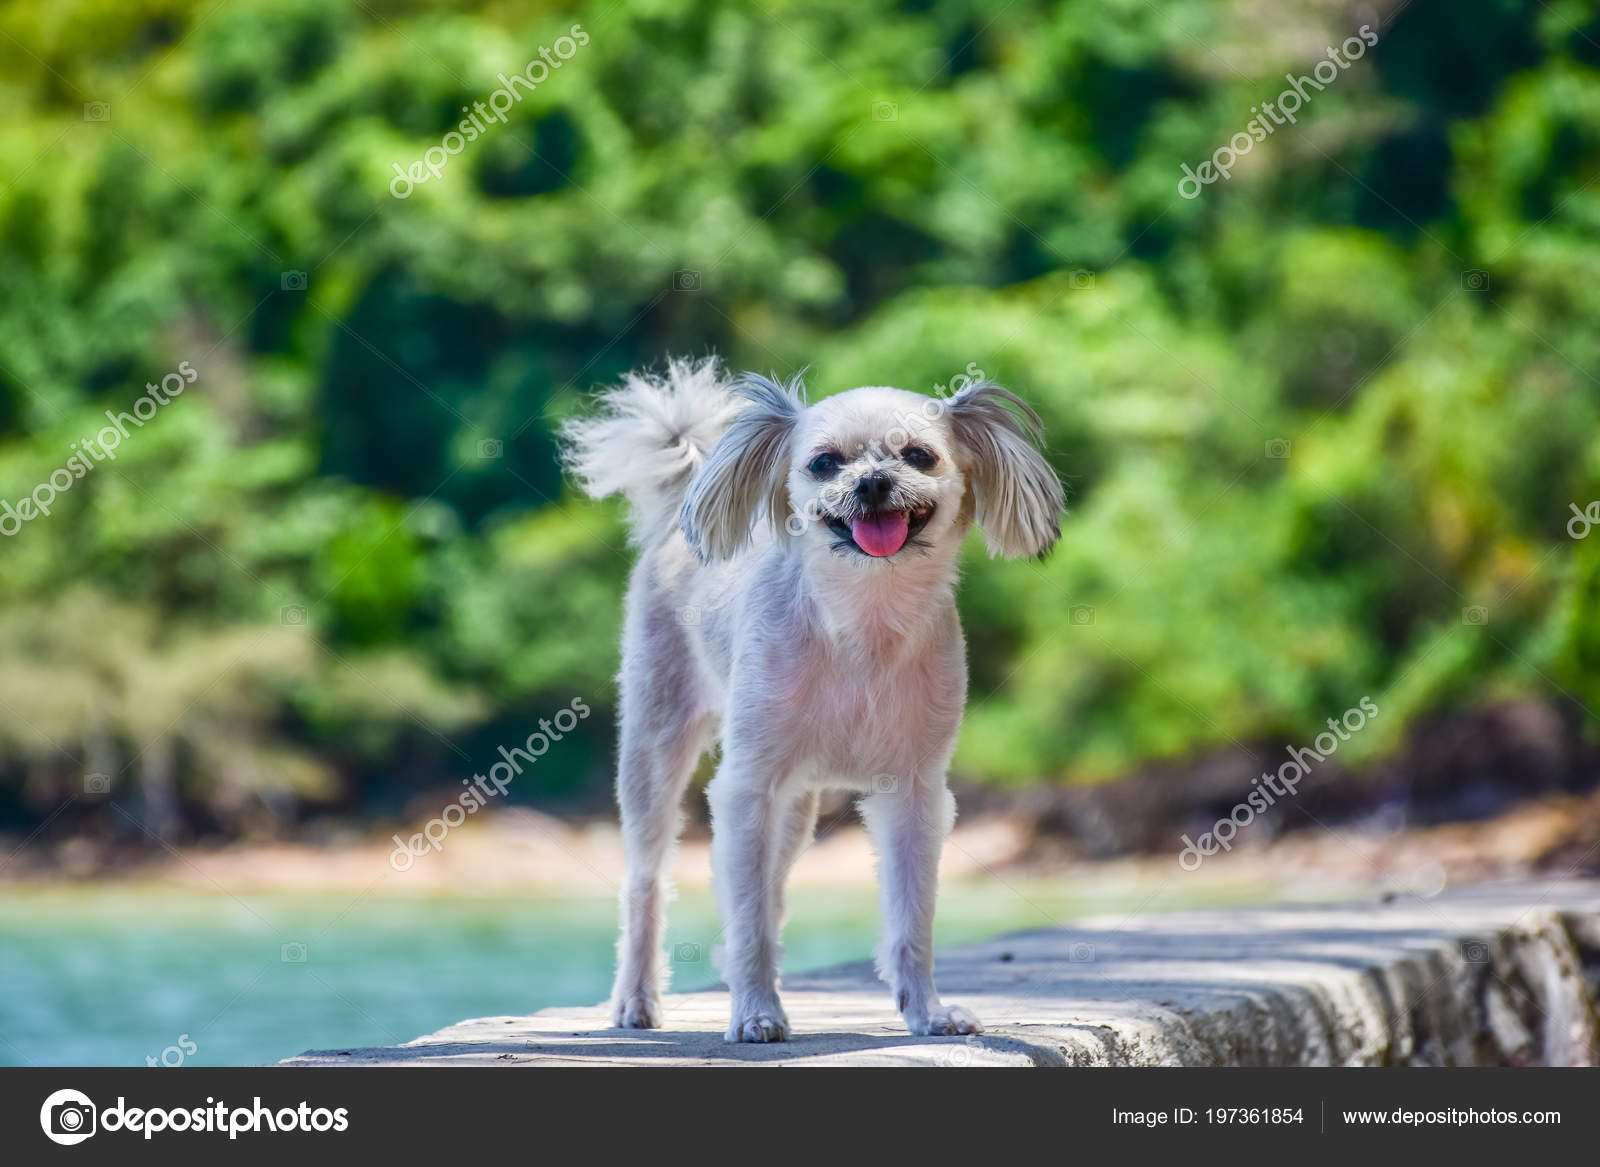 Dog Cute Beige Color Mixed Breed Shih Tzu Pomeranian Poodle Stock